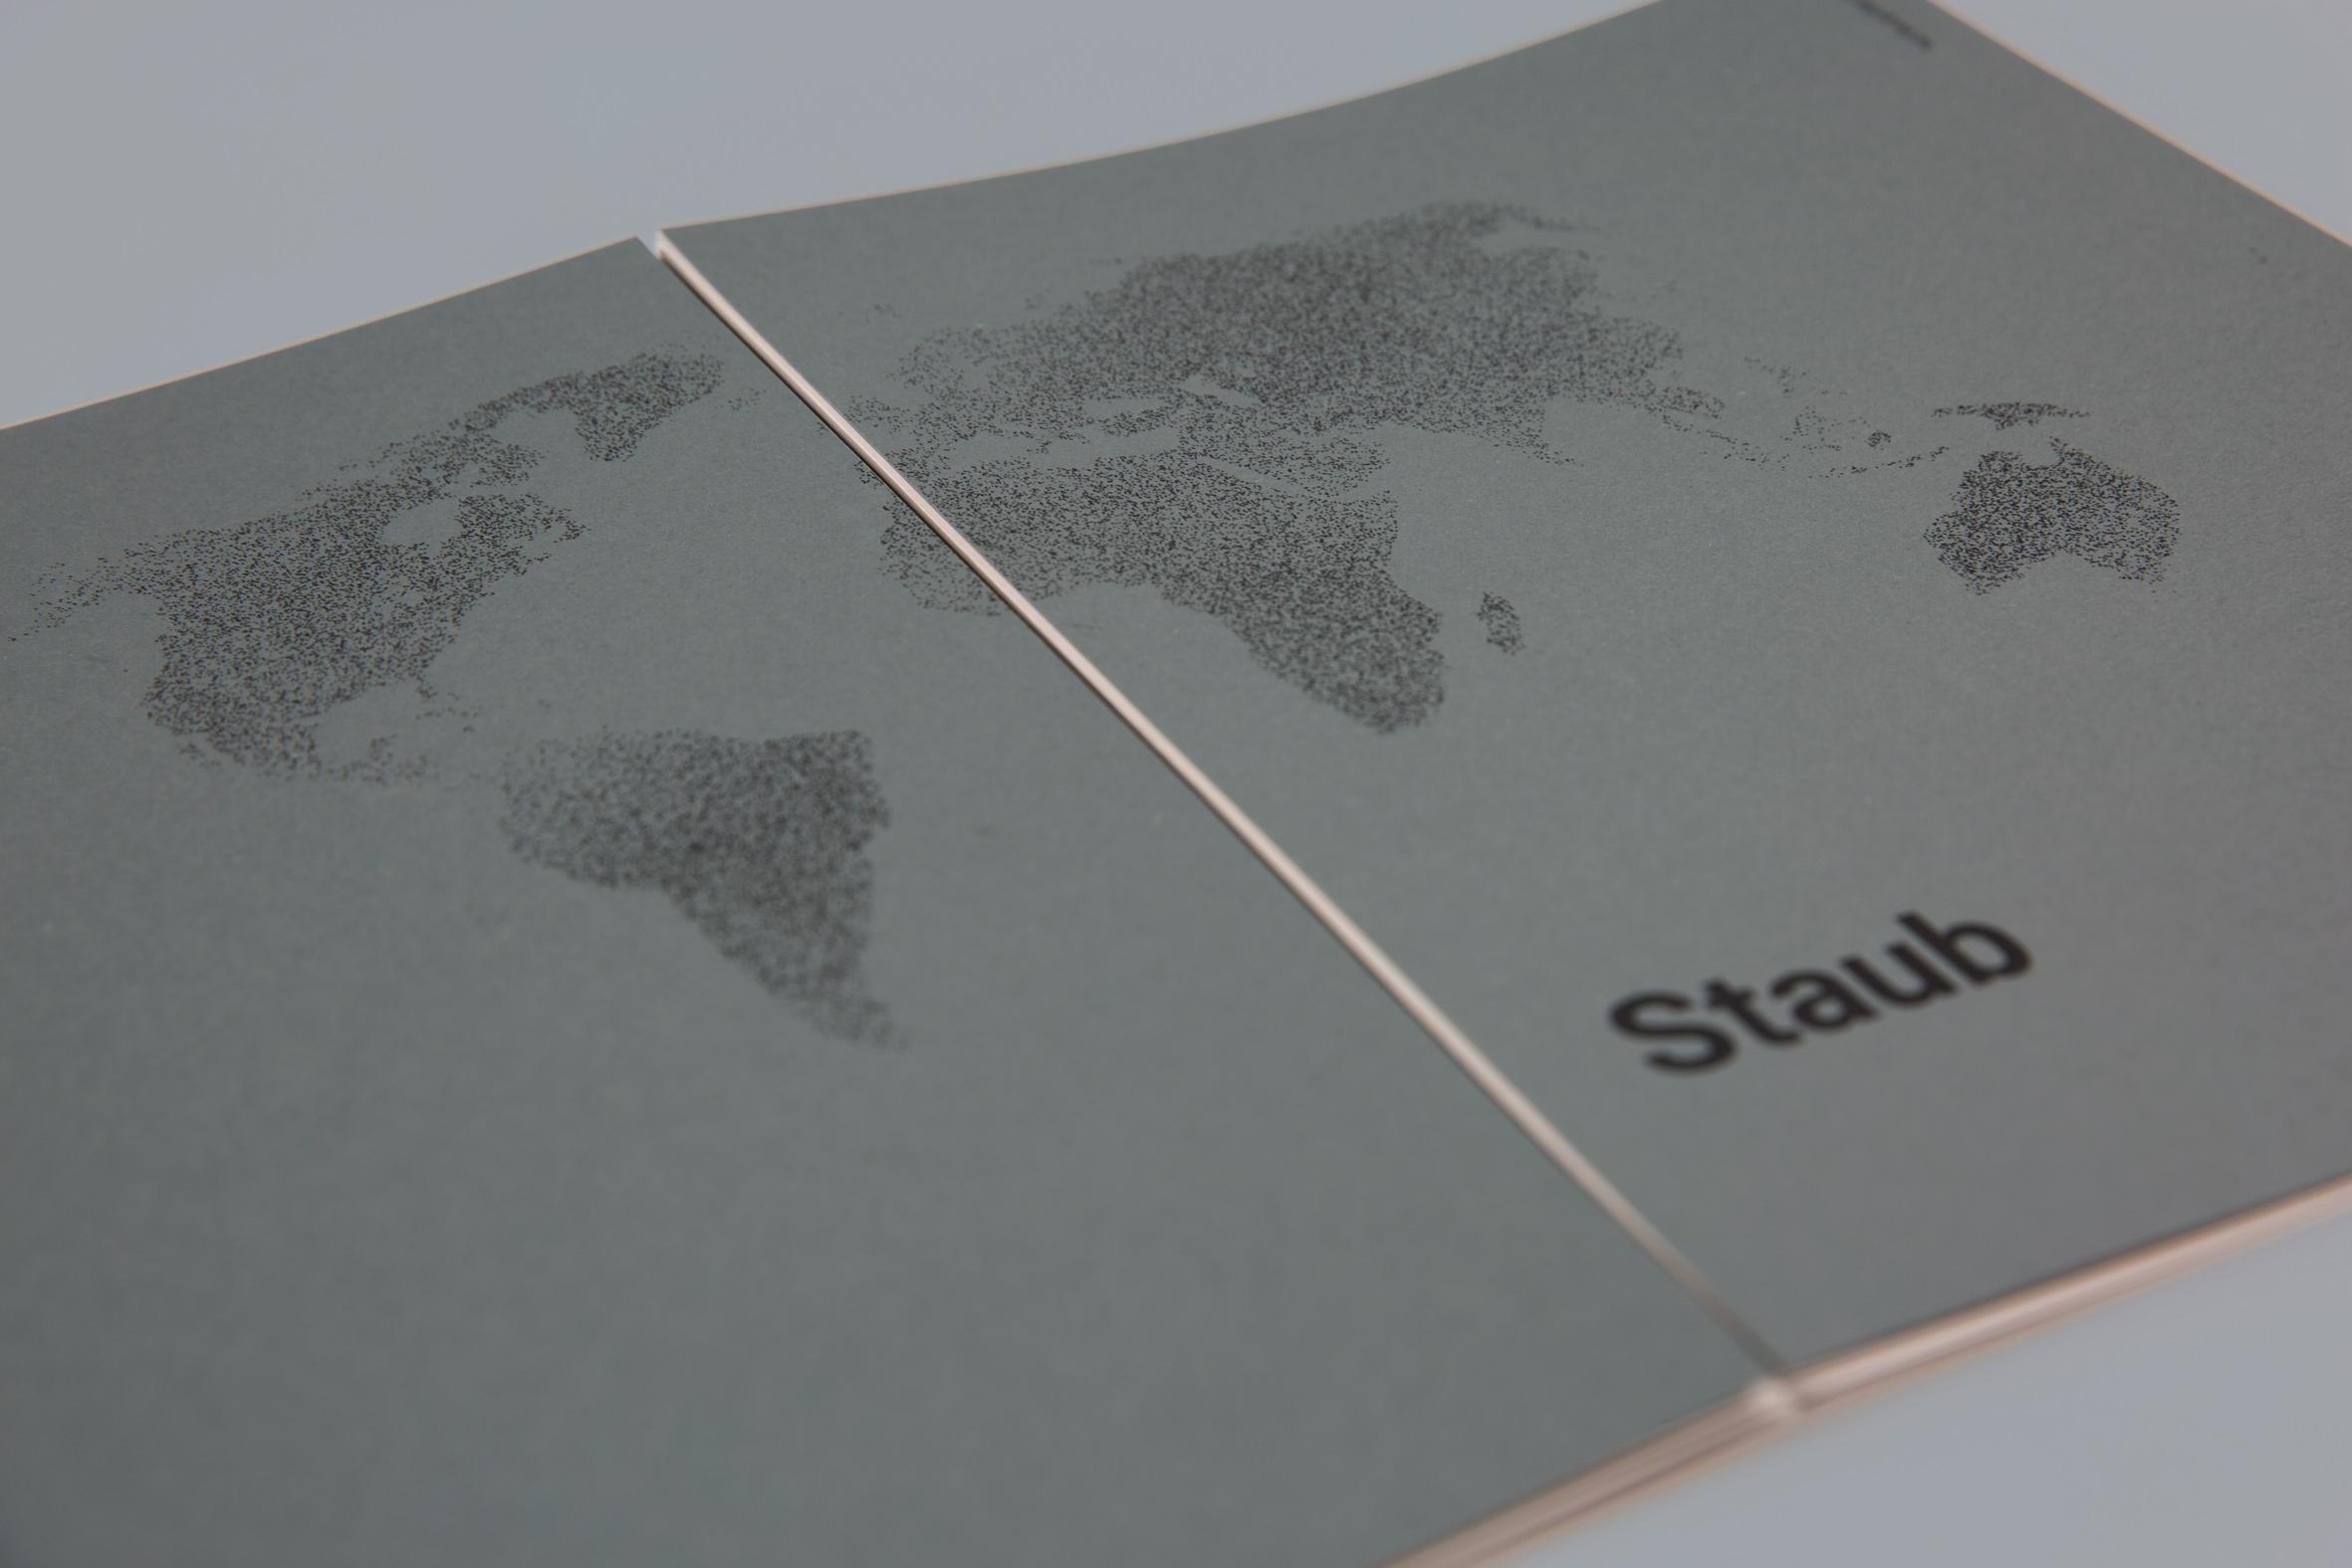 007_Staub